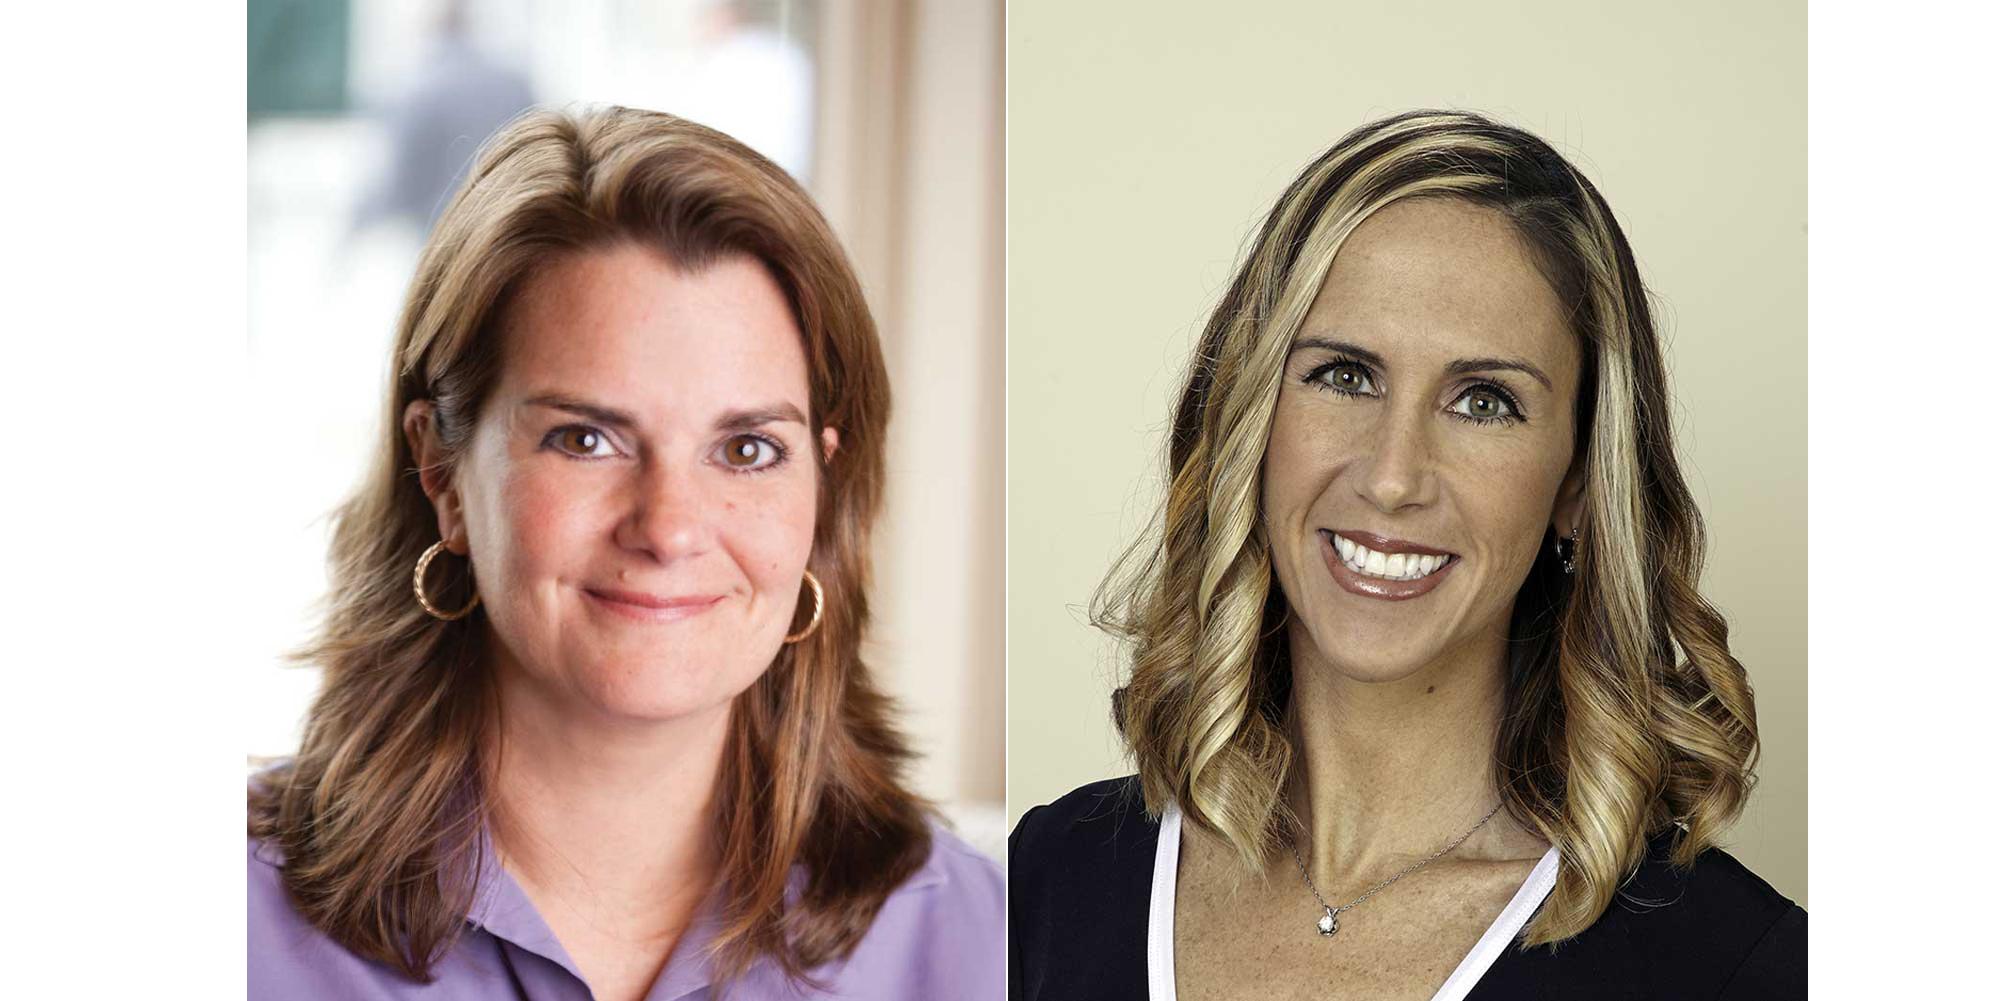 Maine Food Summit Will Spotlight Online/Digital Impact Discussions